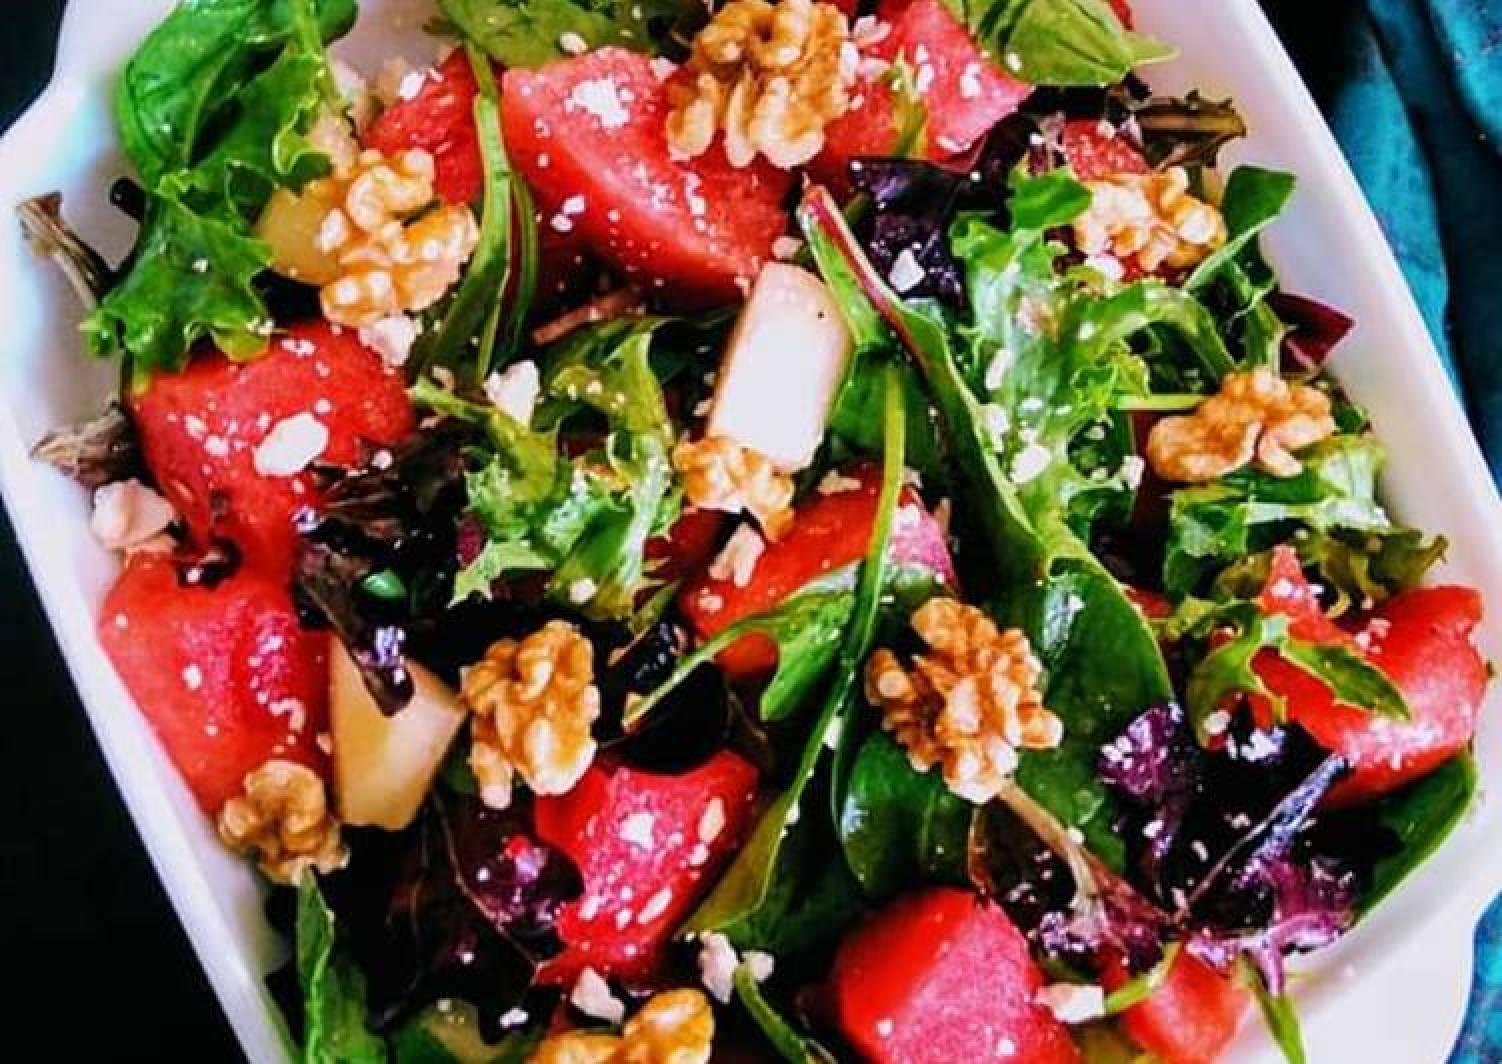 Watermelon & Pears Feta Salad